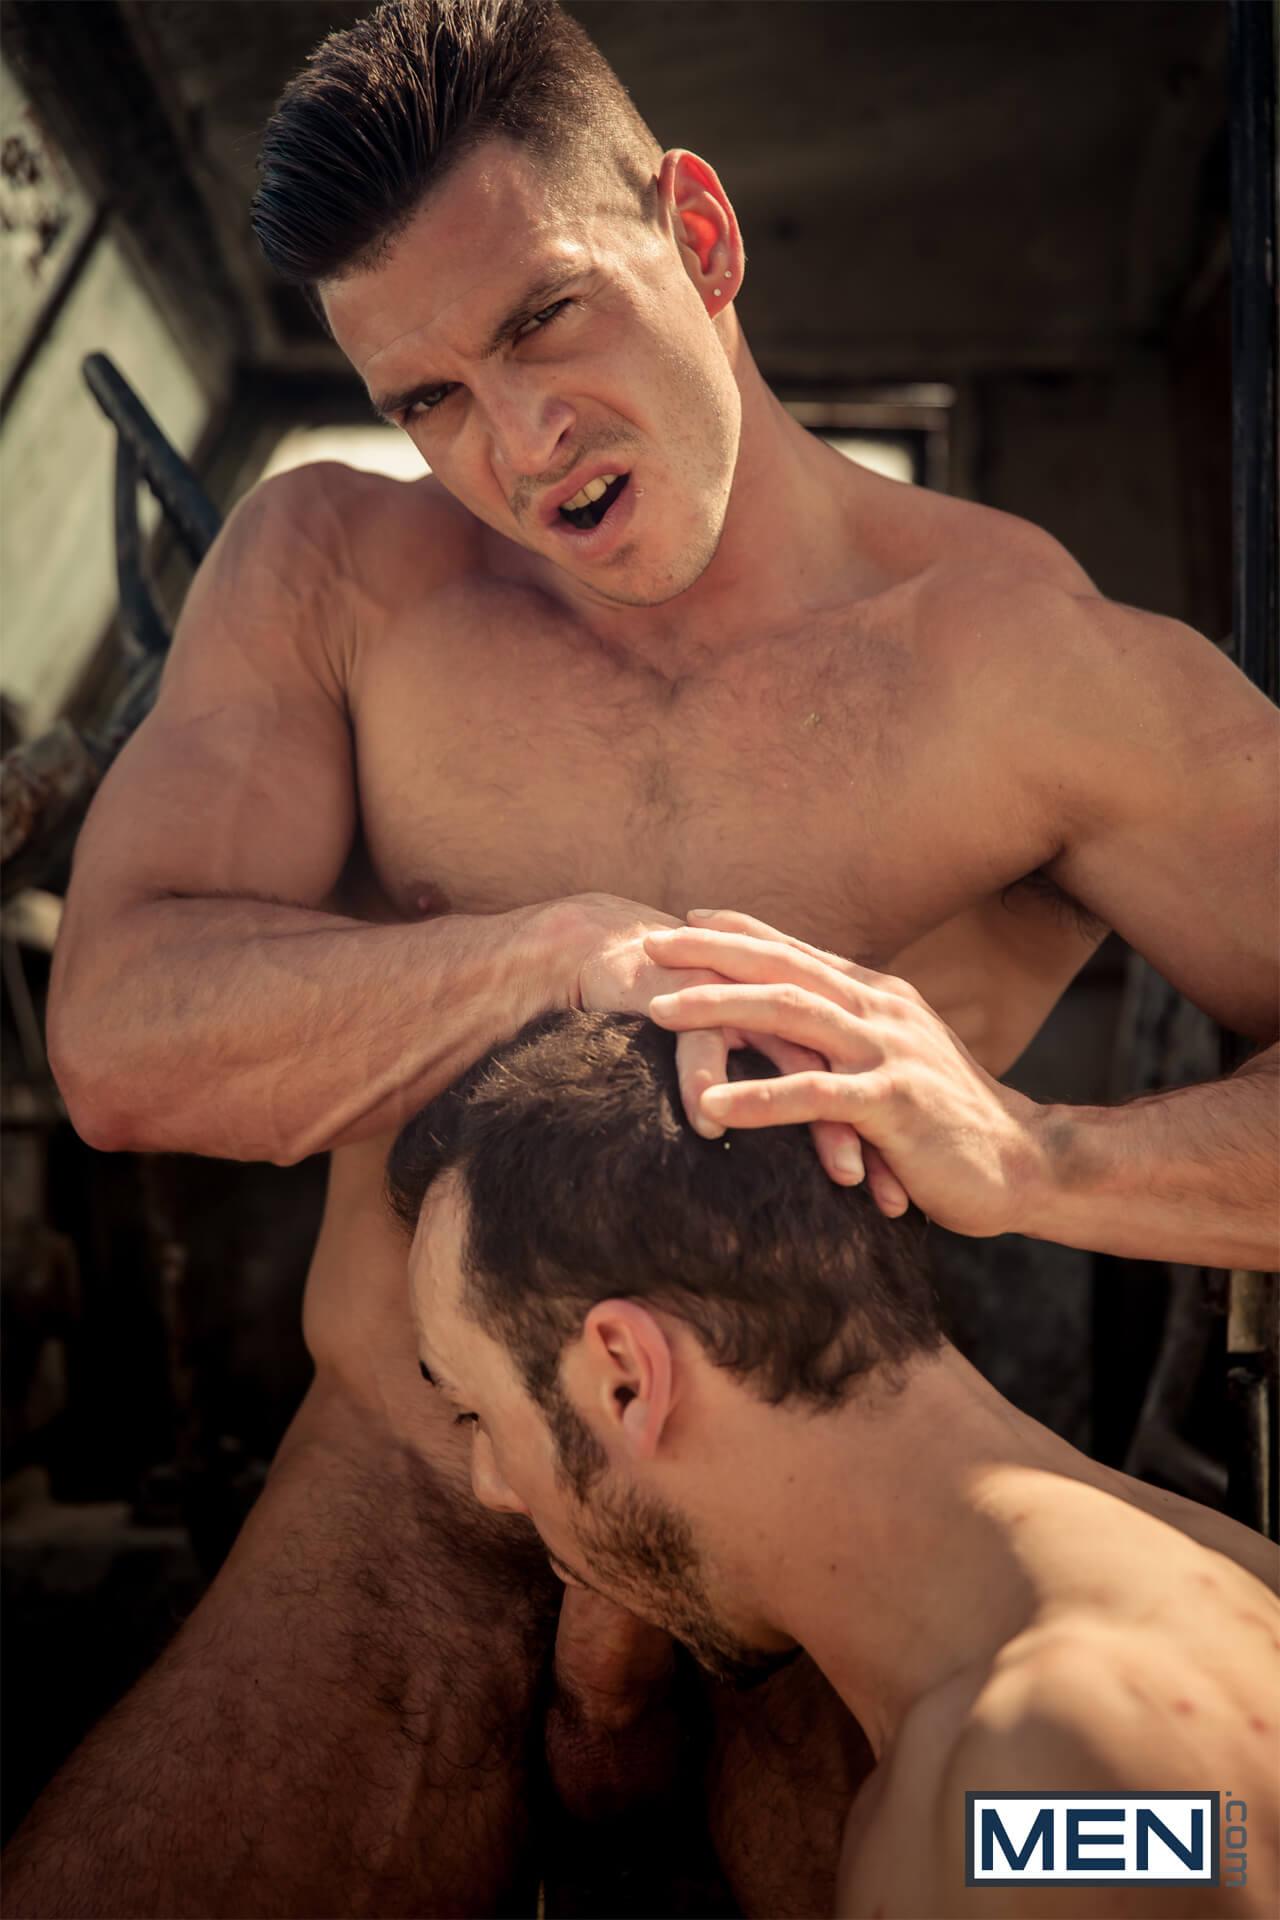 men drill my hole prisoner of war part 3 gabriel vanderloo paddy obrian gay porn blog image 12